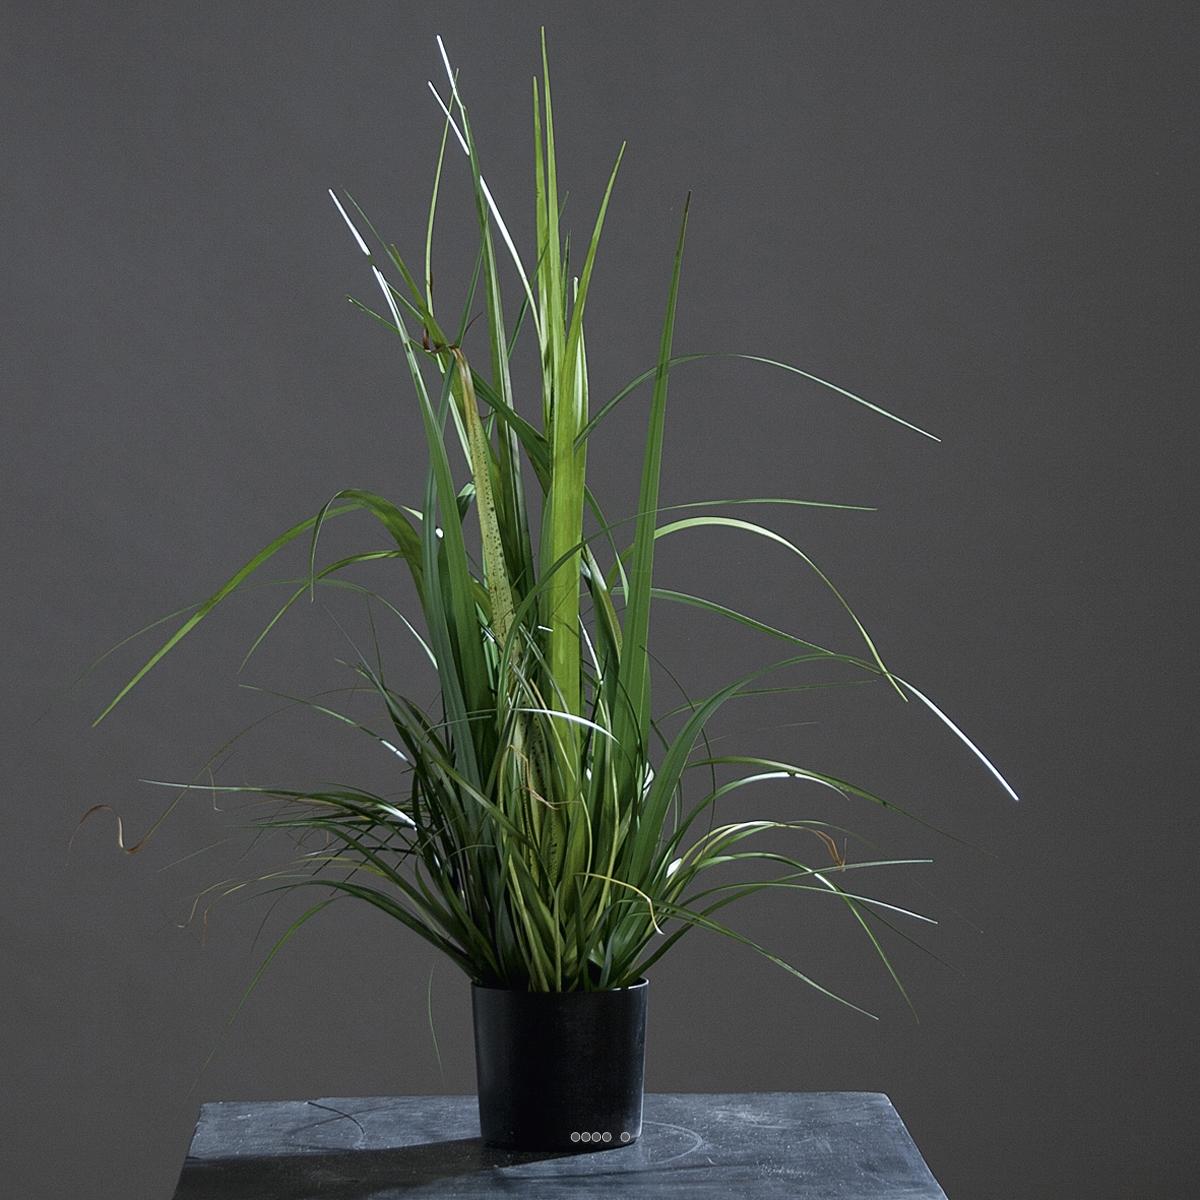 isolepsis herbes folles gramin e artificiel vert en pot d co tr s dense du site. Black Bedroom Furniture Sets. Home Design Ideas